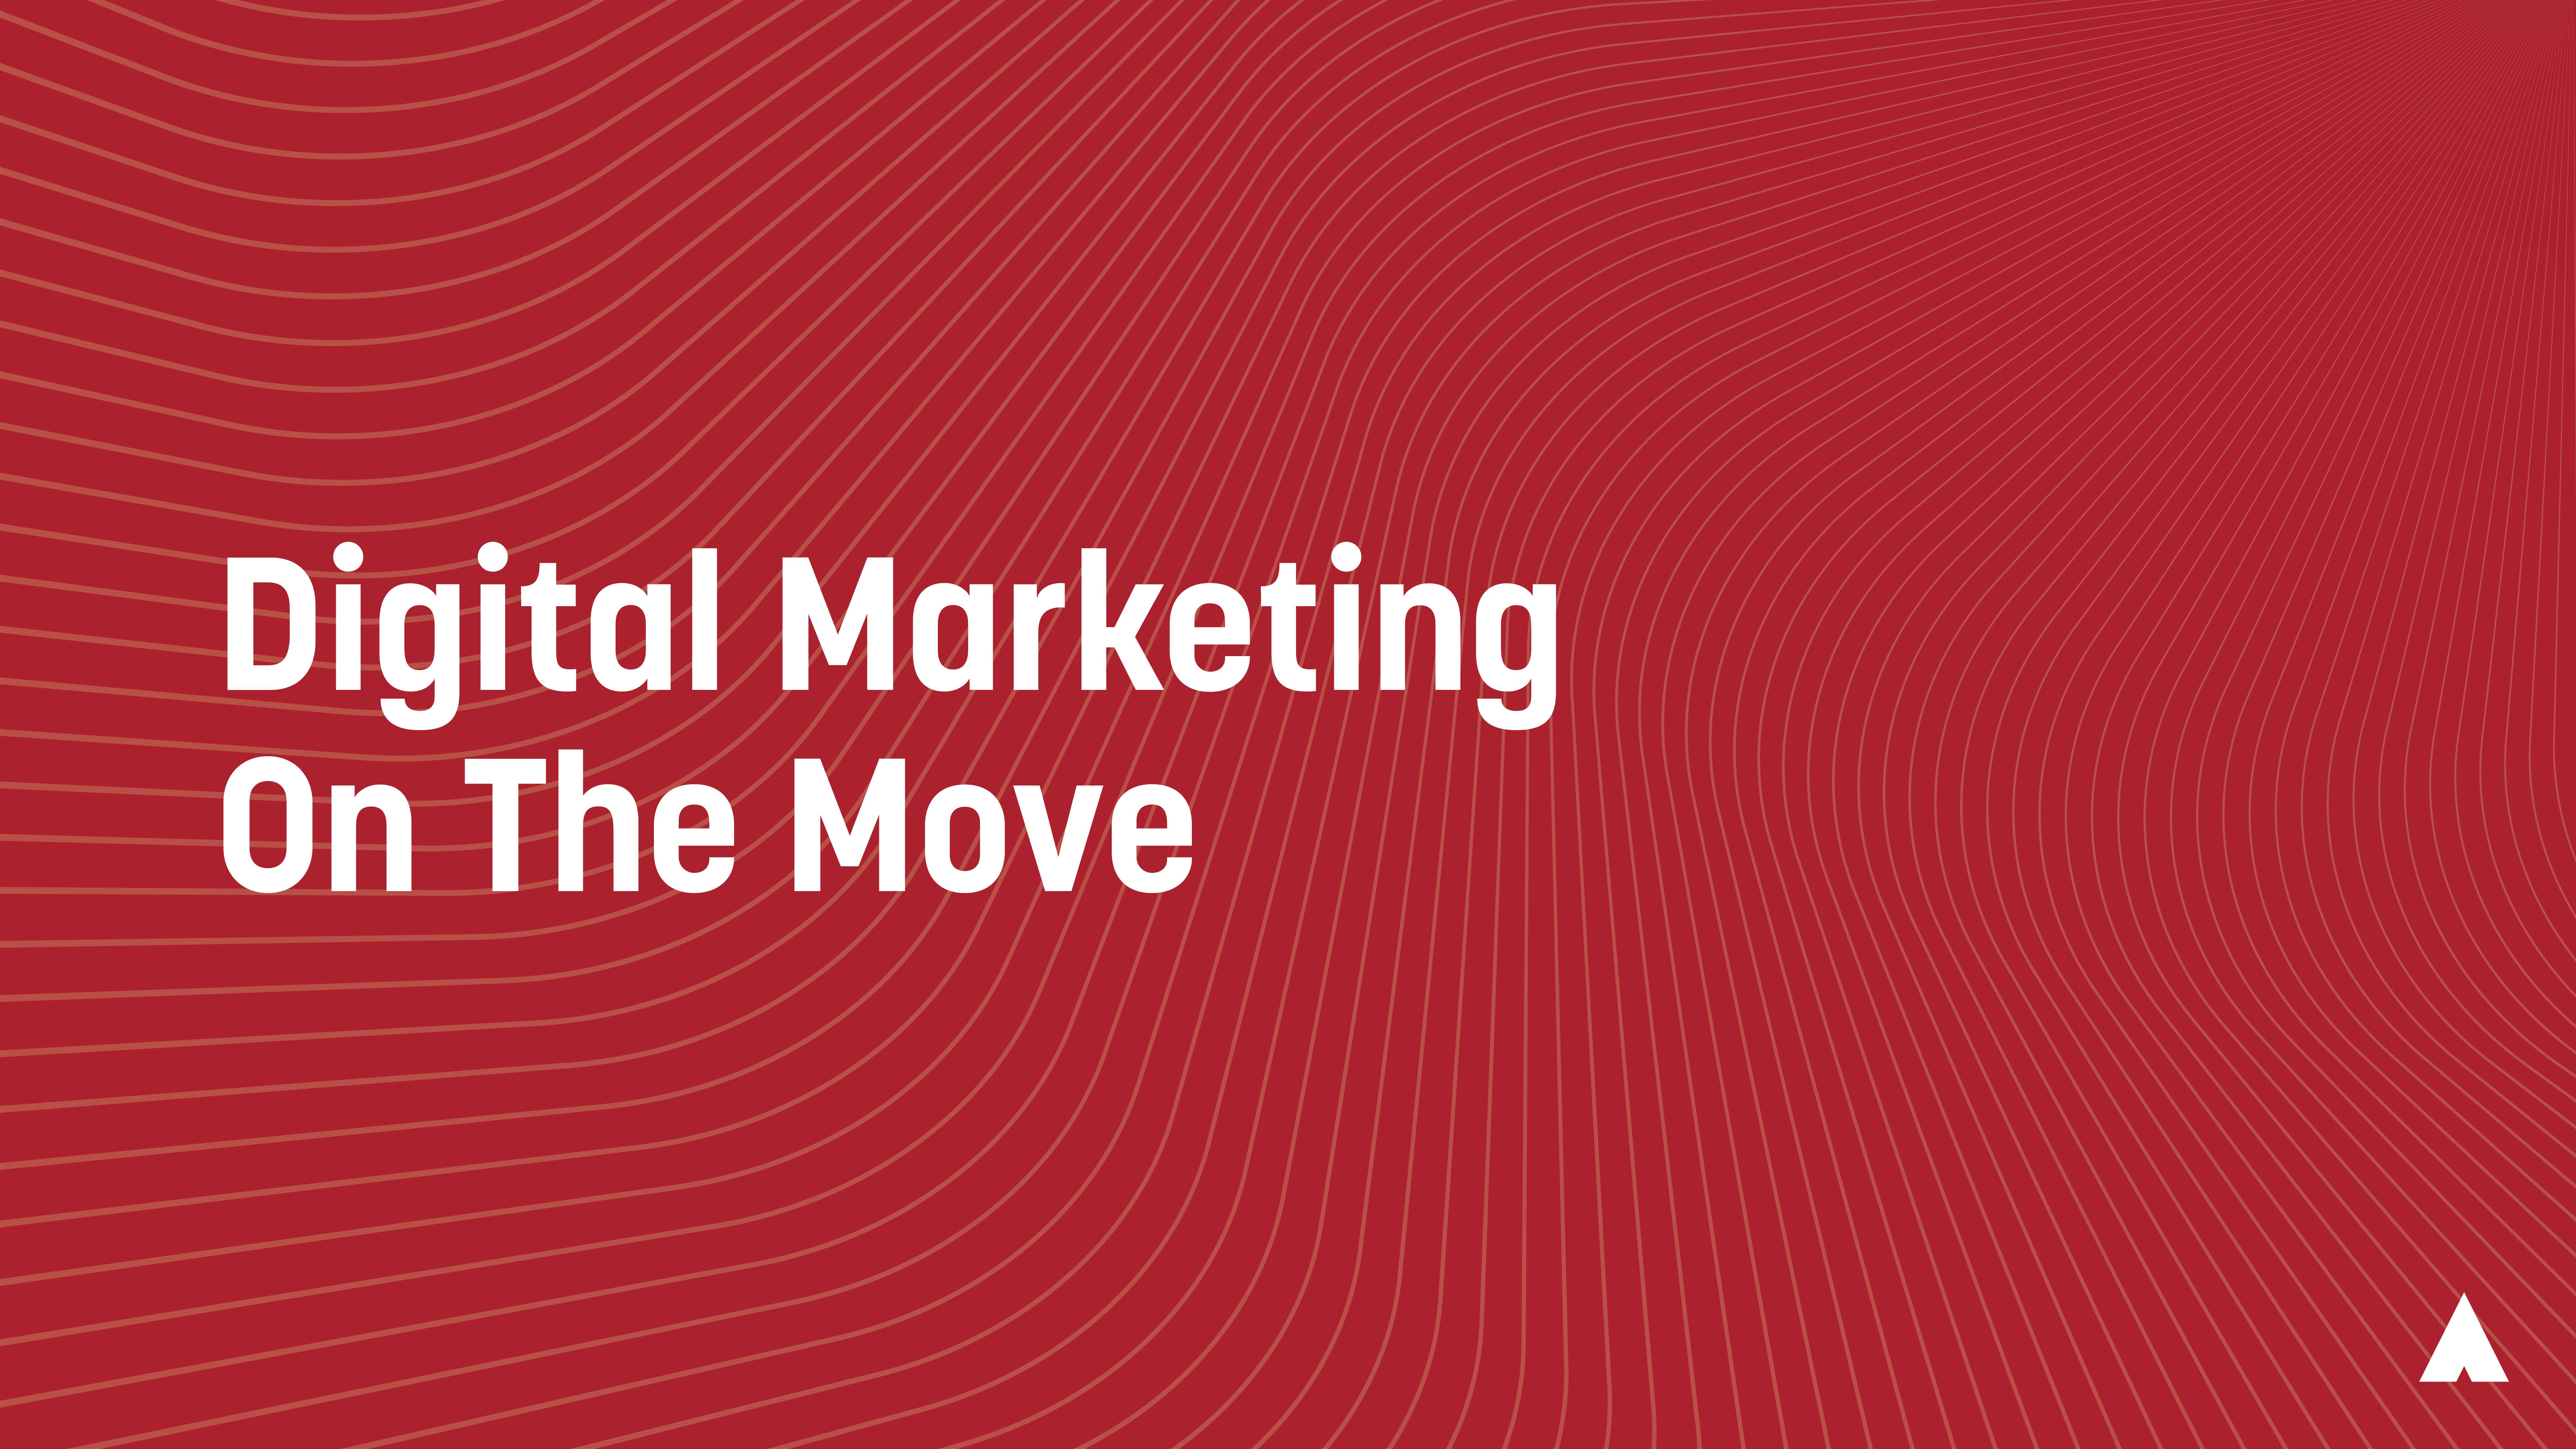 Digital Marketing On The Move